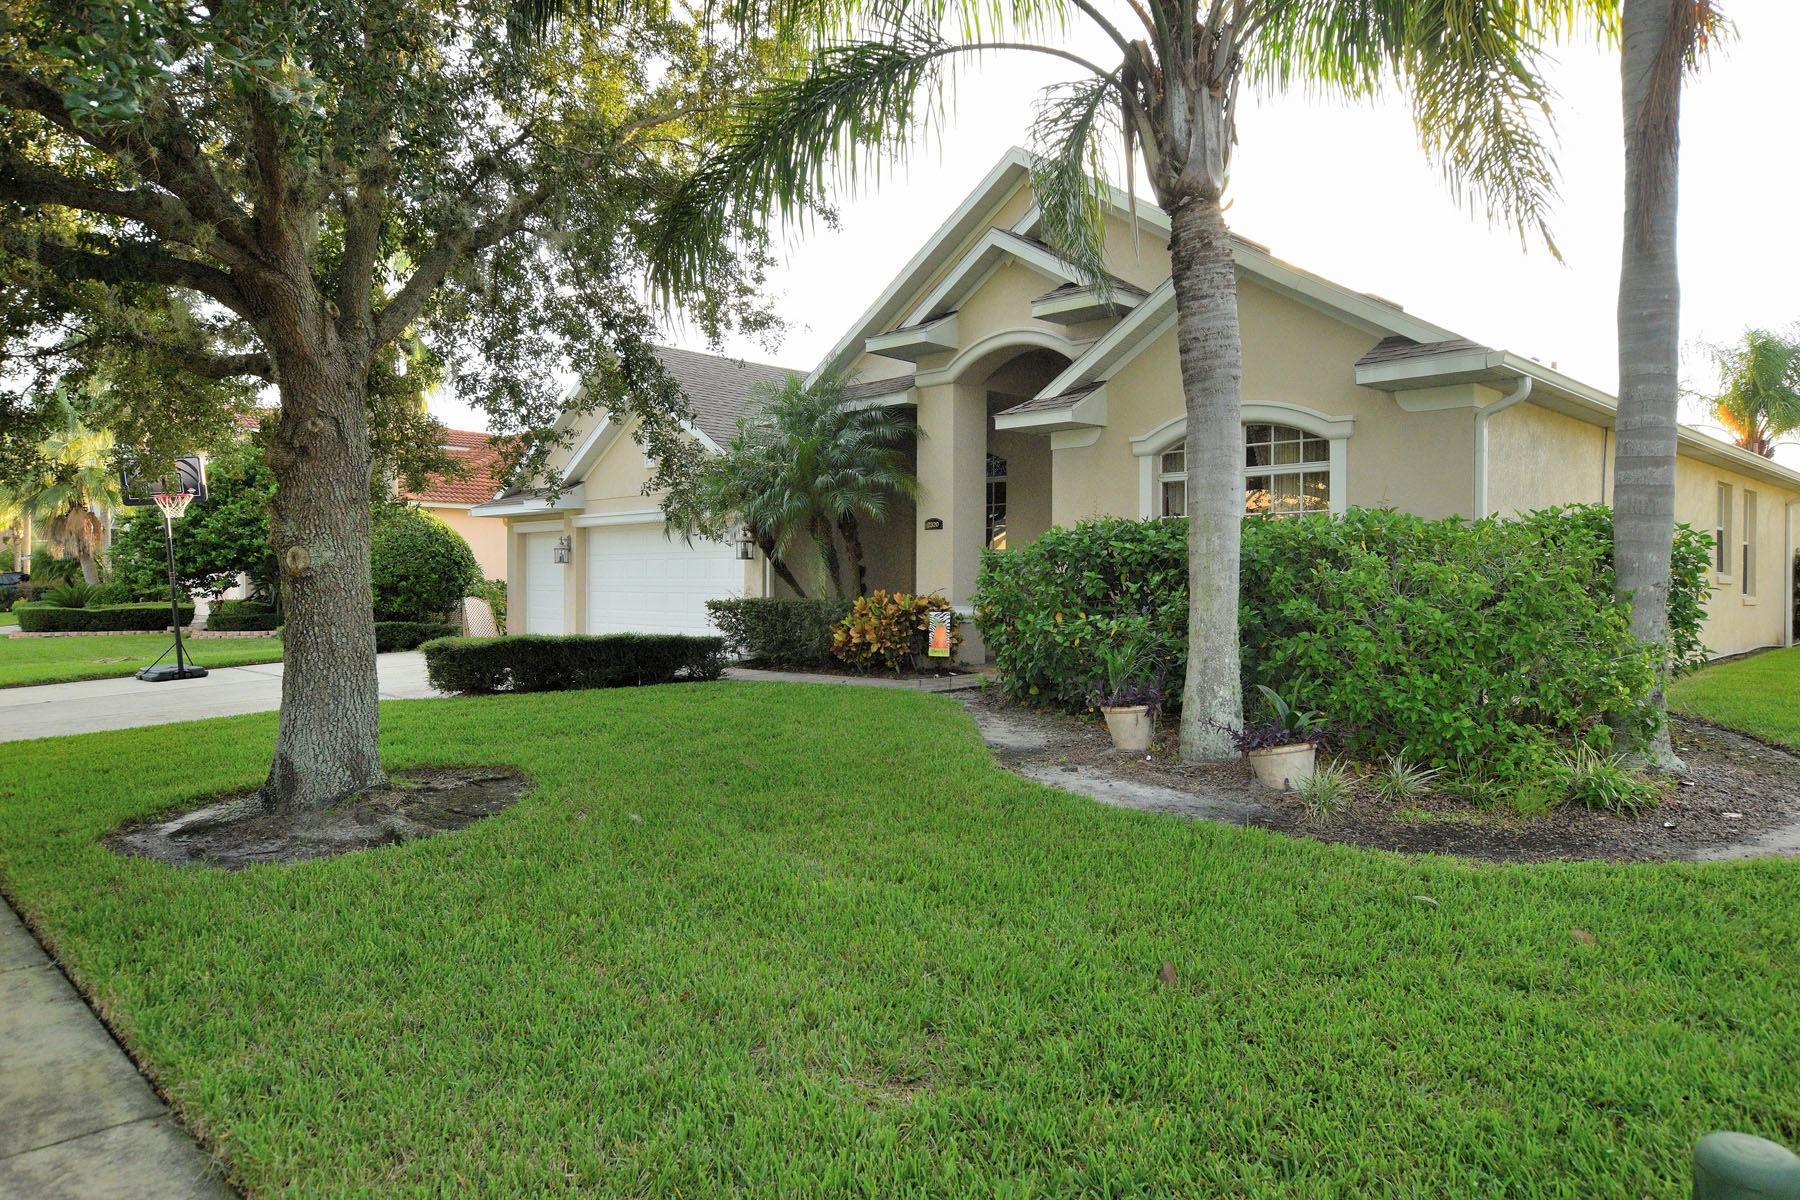 2320 Wintermere Pointe Dr For Rent - Winter Garden, FL | Trulia